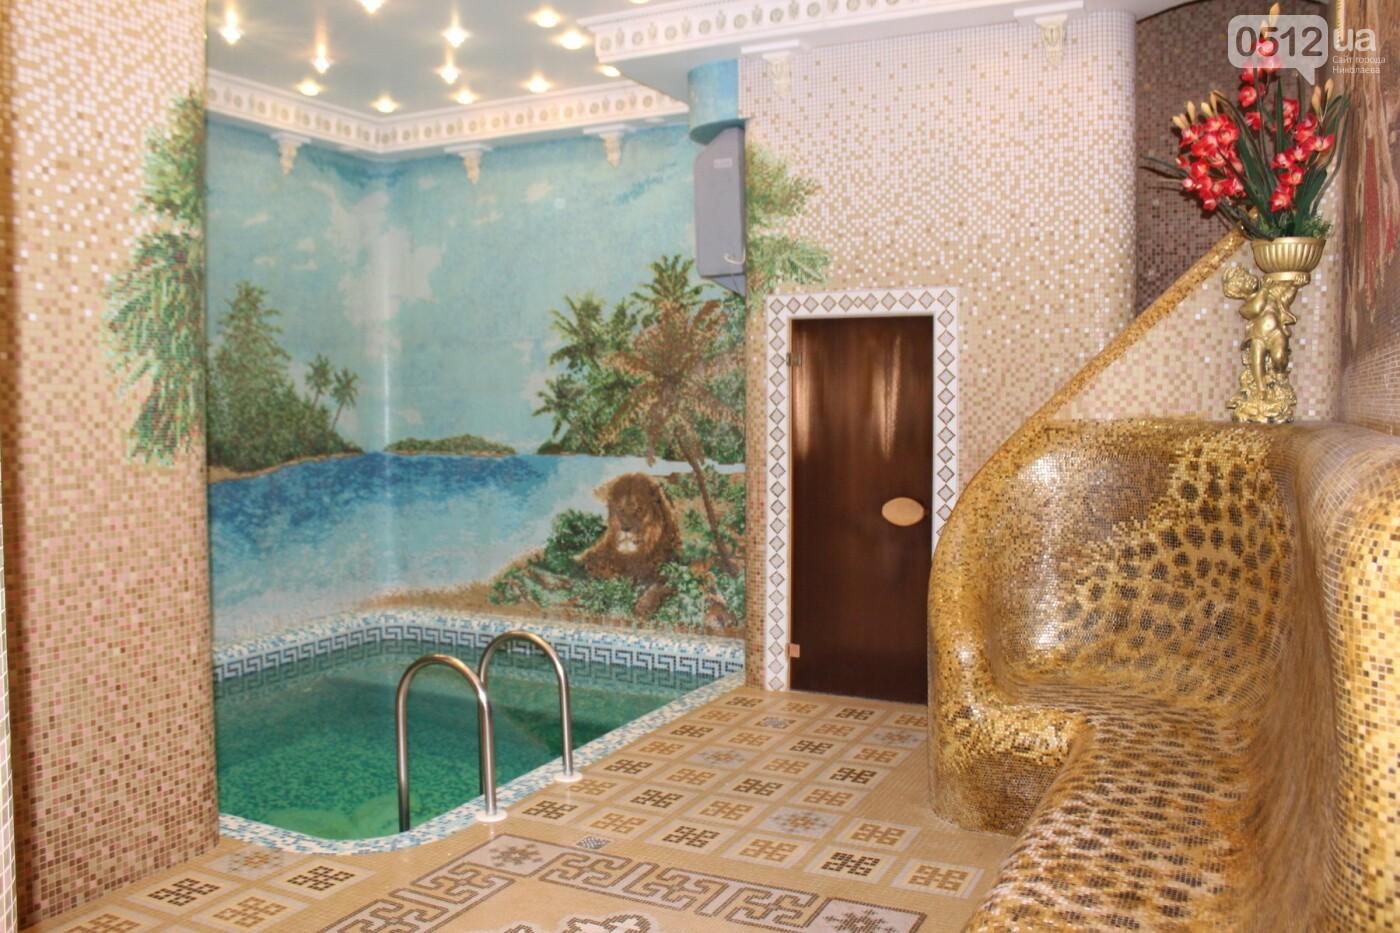 Гостиница Цезарь - сауна в Николаеве